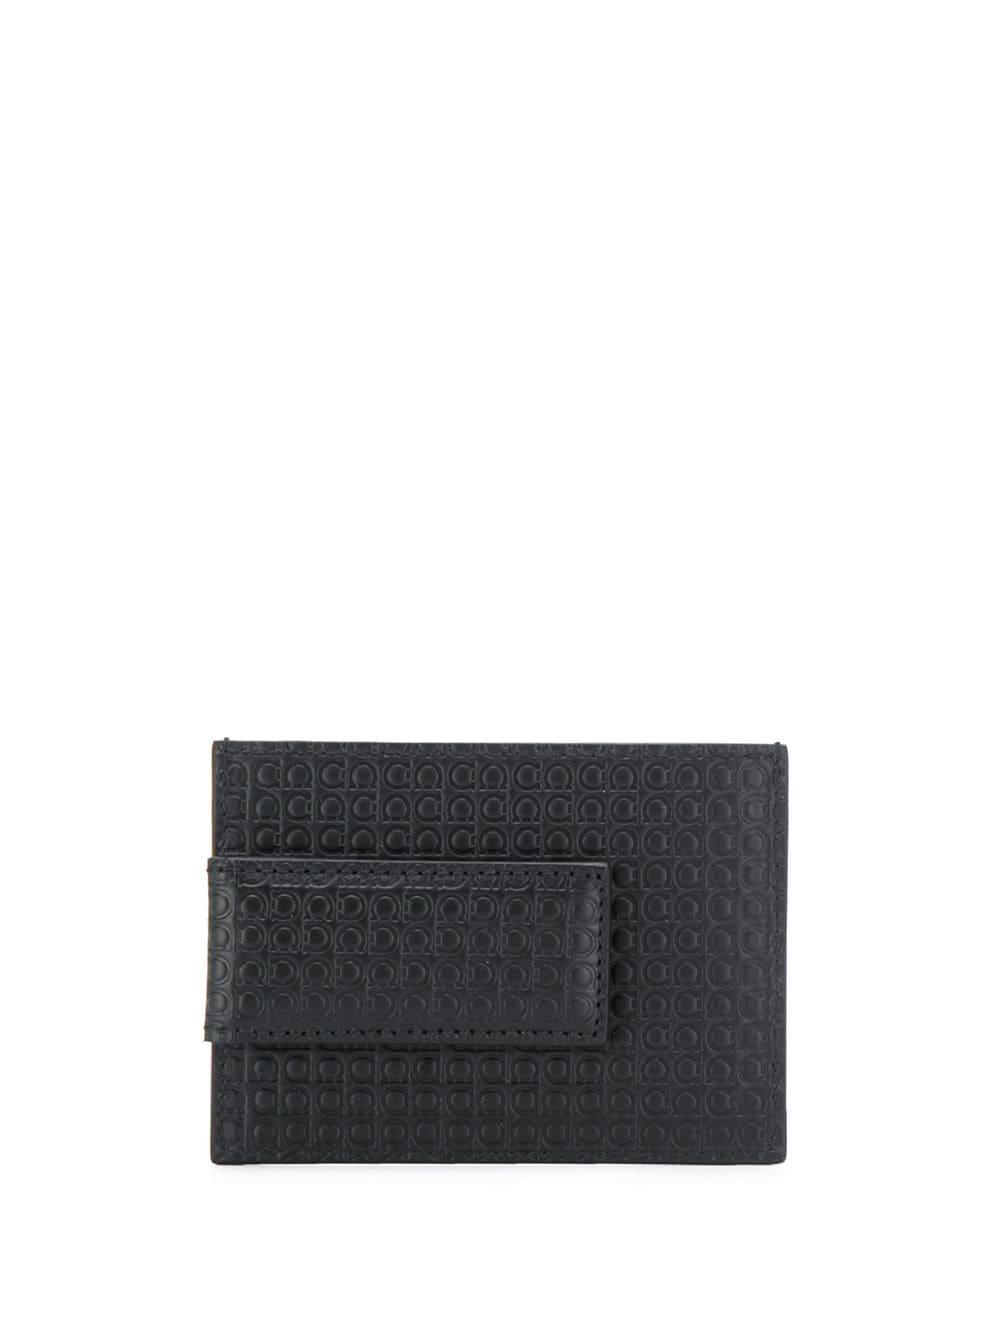 Mini Gancio Leather Card Holder